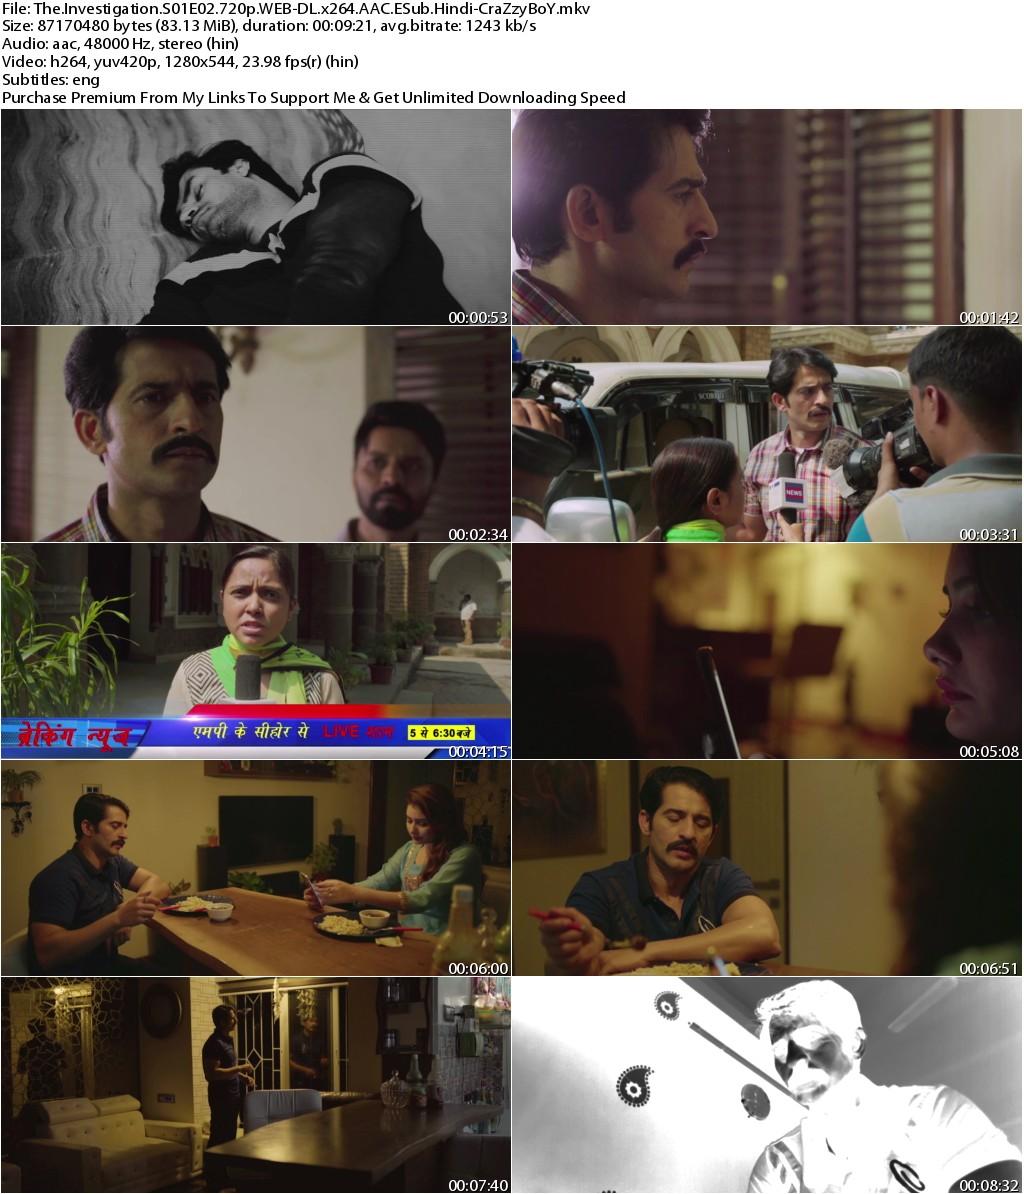 The Investigation Season 01 All 09 Episodes 720p WEB-DL x264 AAC ESub Hindi 790MB-CraZzyBoY